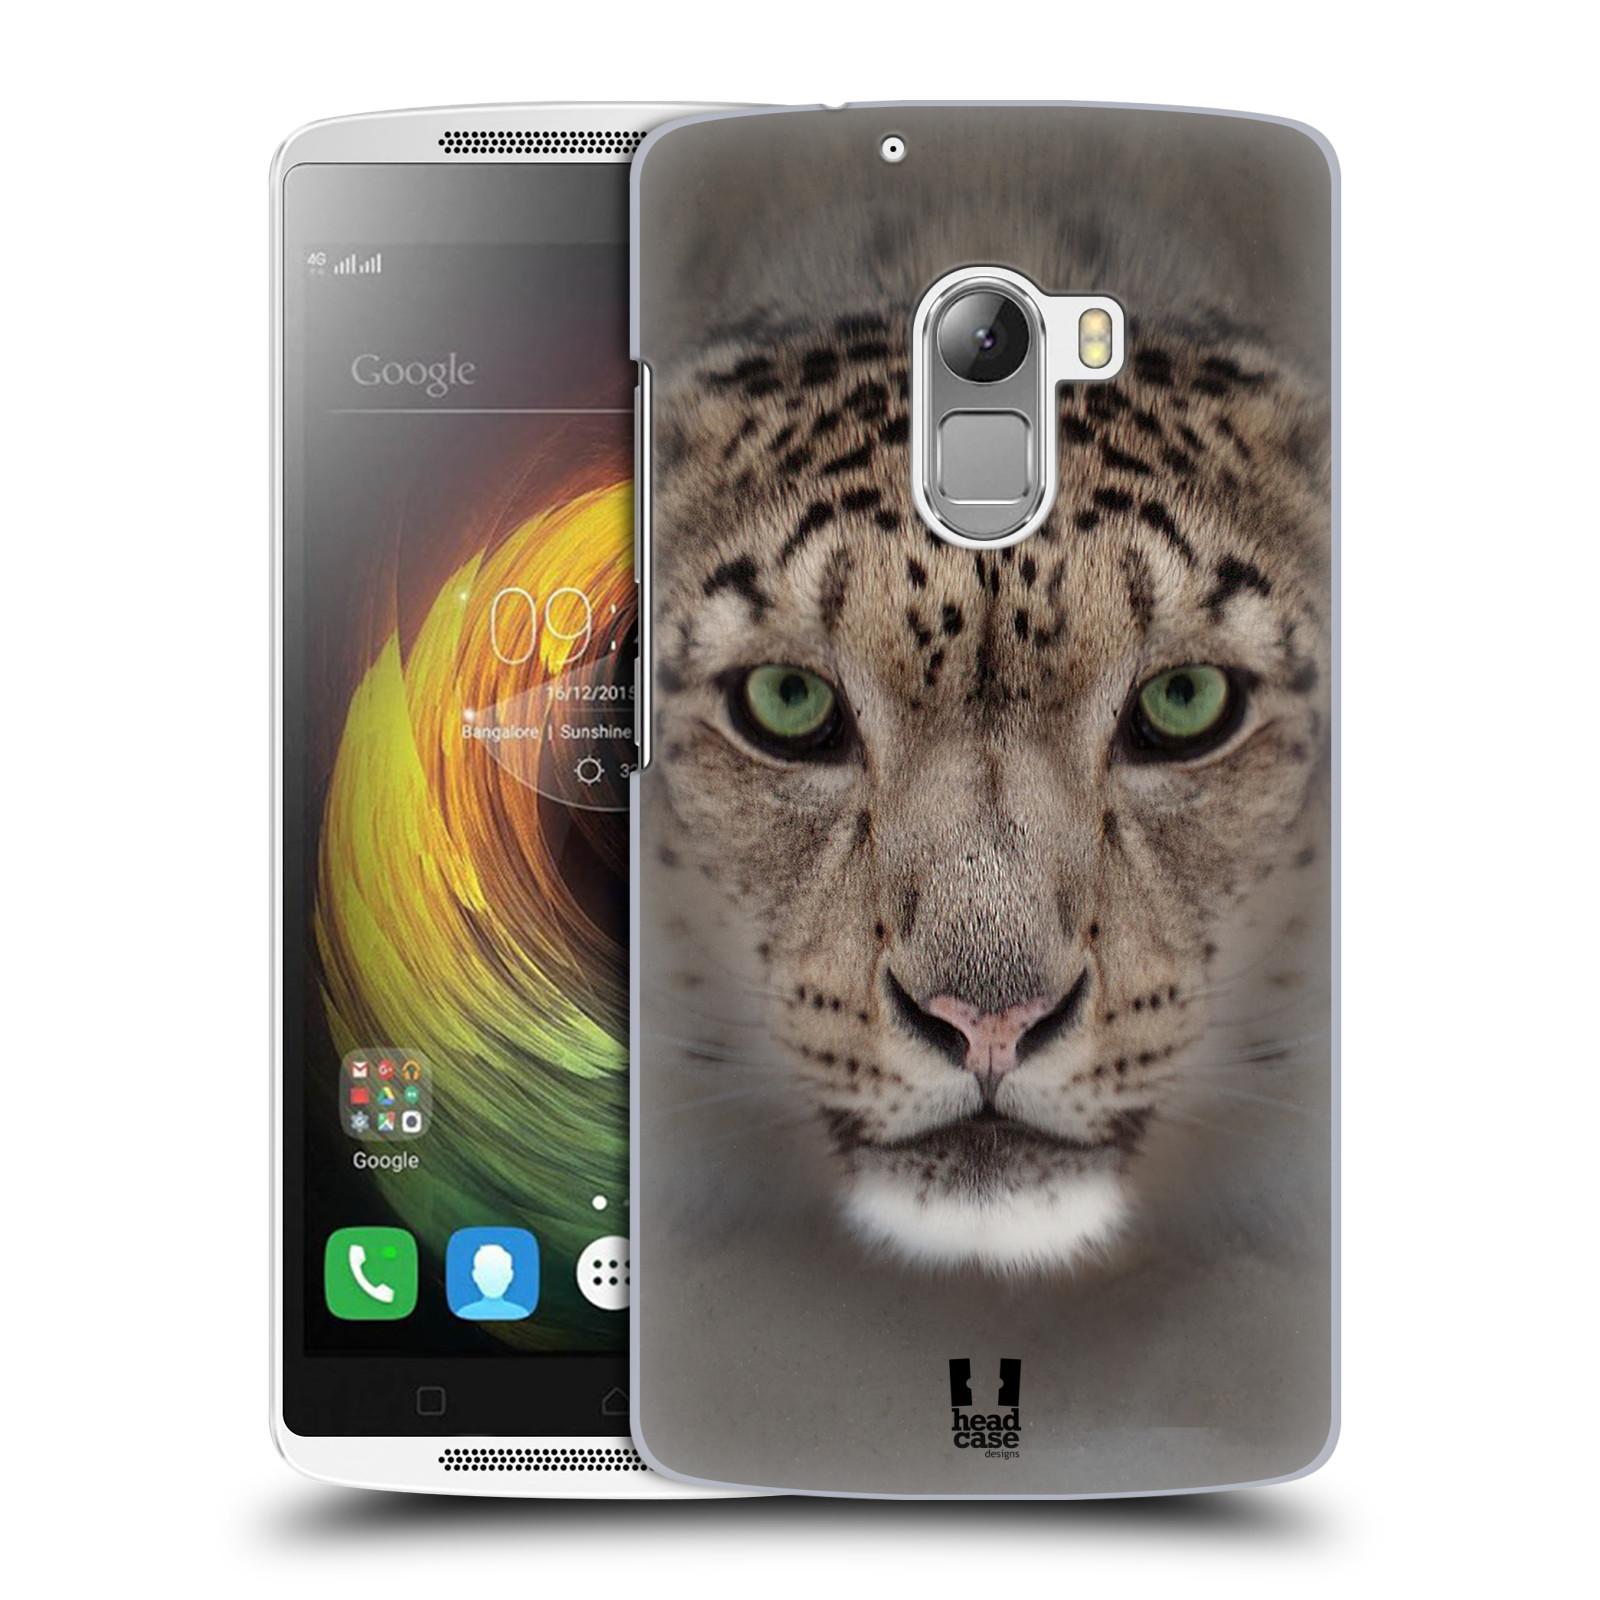 HEAD CASE pevný plastový obal na mobil LENOVO A7010 / A7010 DUAL / K4 Note / Vibe X3 lite vzor Zvířecí tváře 2 sněžný leopard